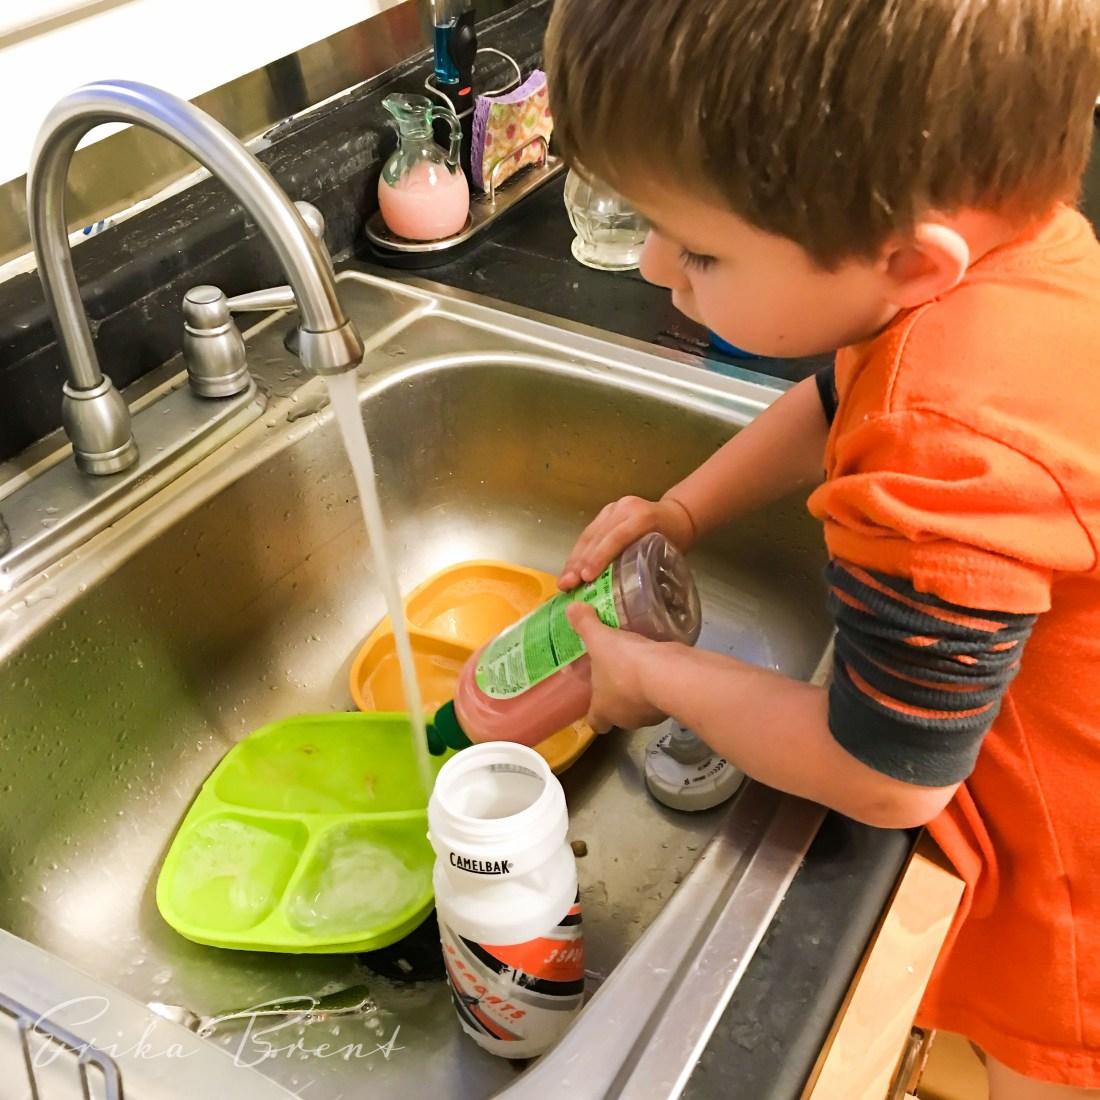 Frosch Pomegranate Dishwashing Liquid